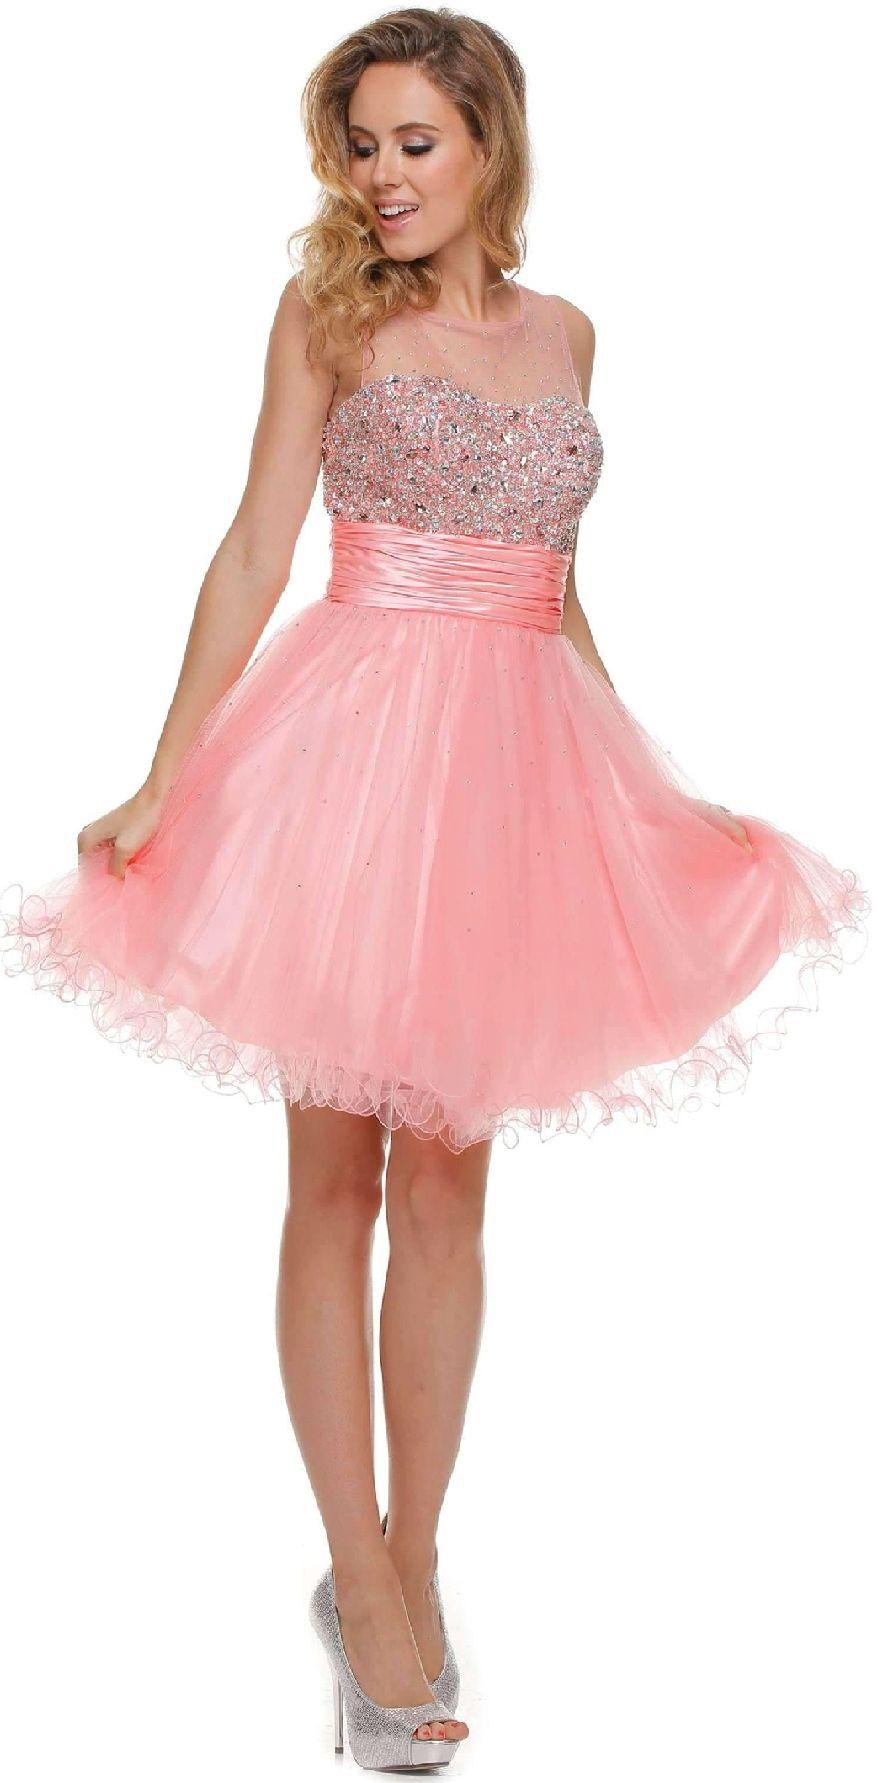 Wedding dresses under $200  Prom Sweet Evening Dresses under  by JULIETucBRueajtucBRueShort